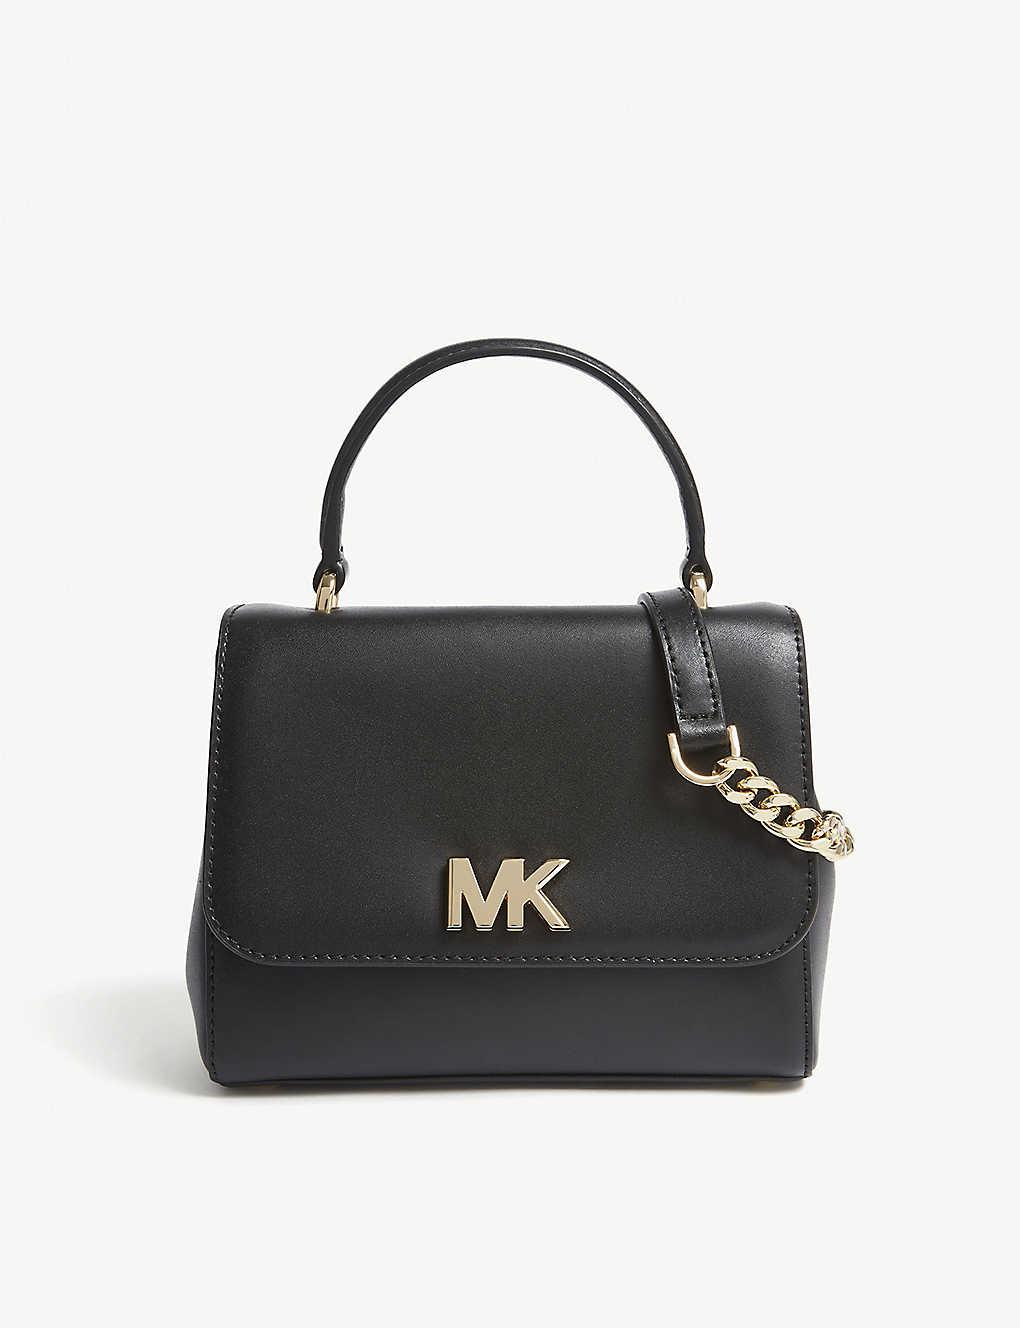 95516106d959 MICHAEL MICHAEL KORS - Mott small leather satchel